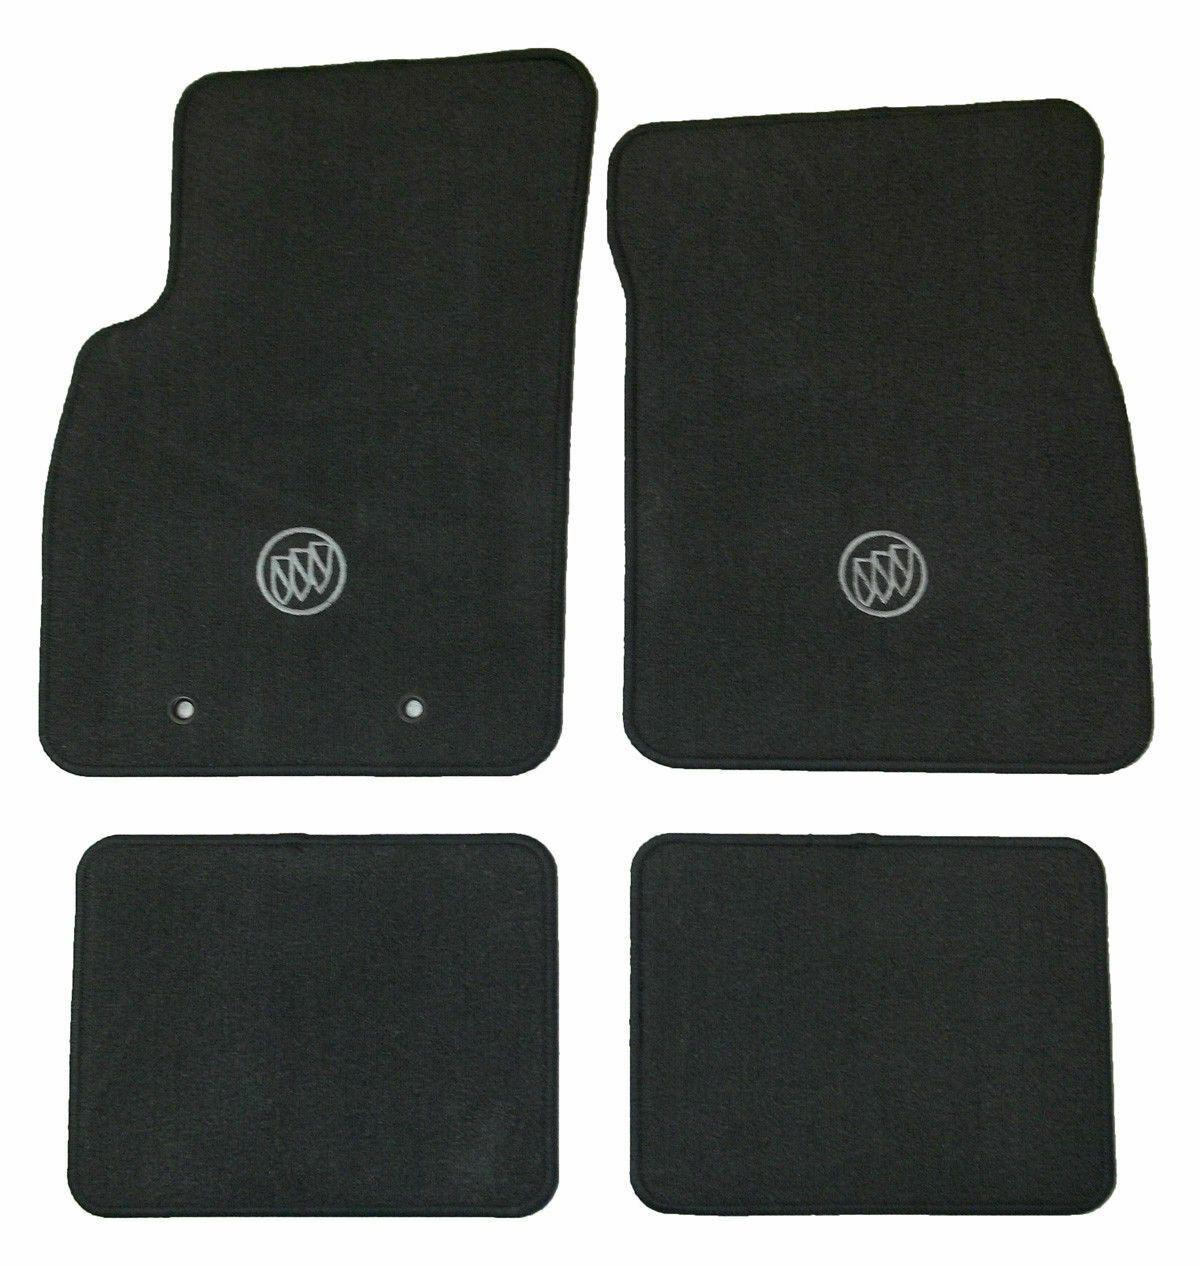 20082011 Buick Lucerne Floor Mats Floormats Black Ebony